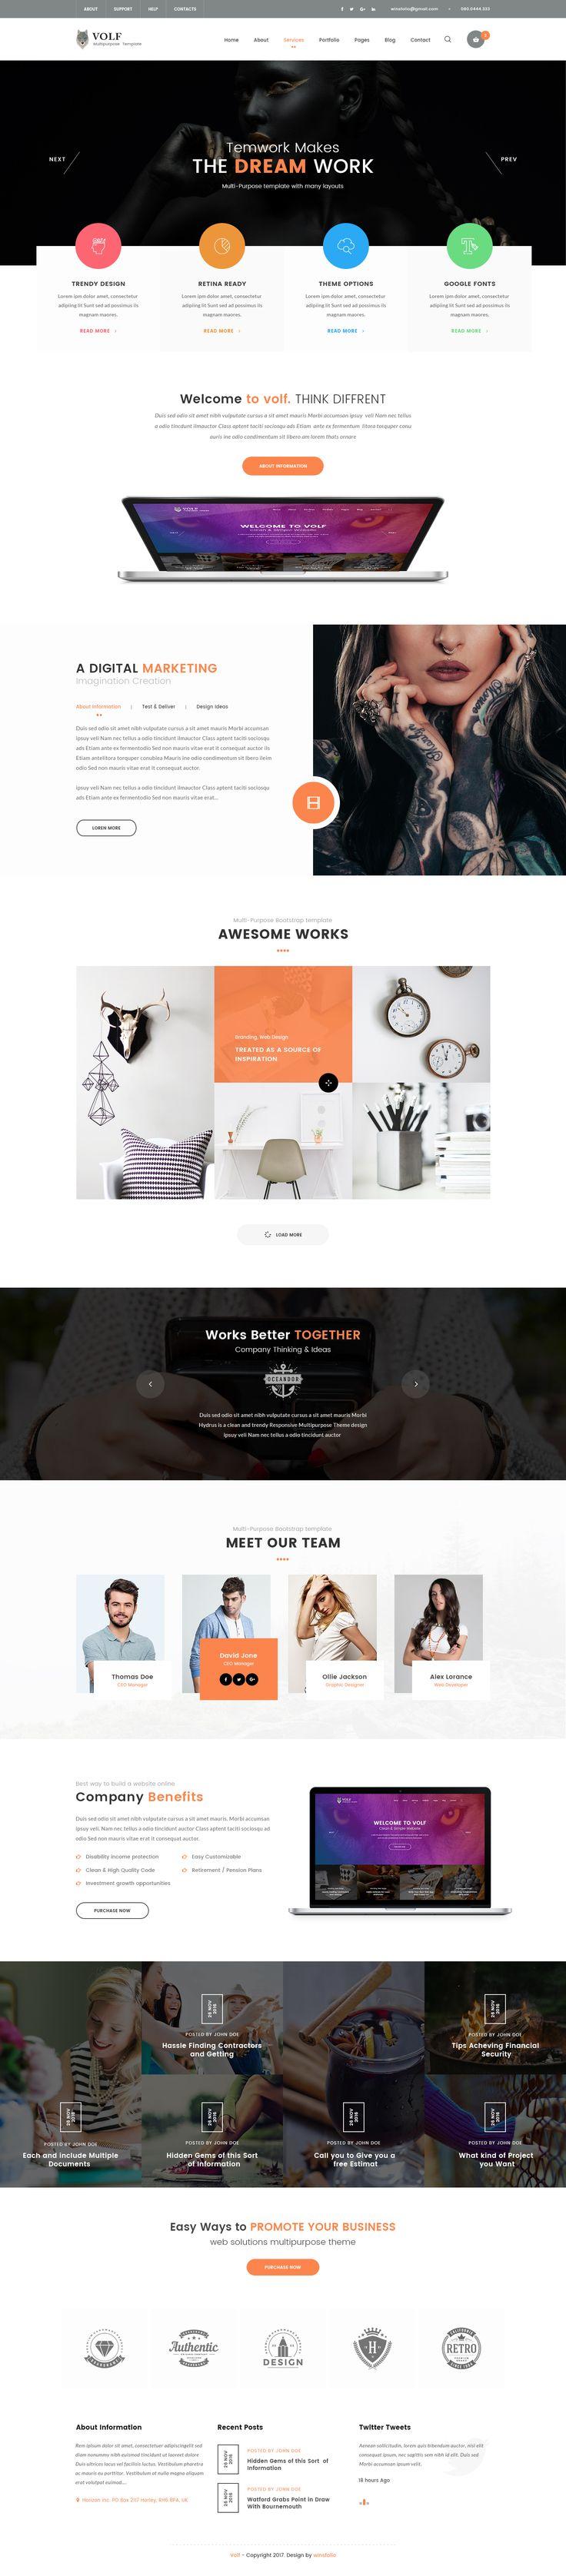 Volf - Creative Multipurpose PSD Template by winsfolio | ThemeForest